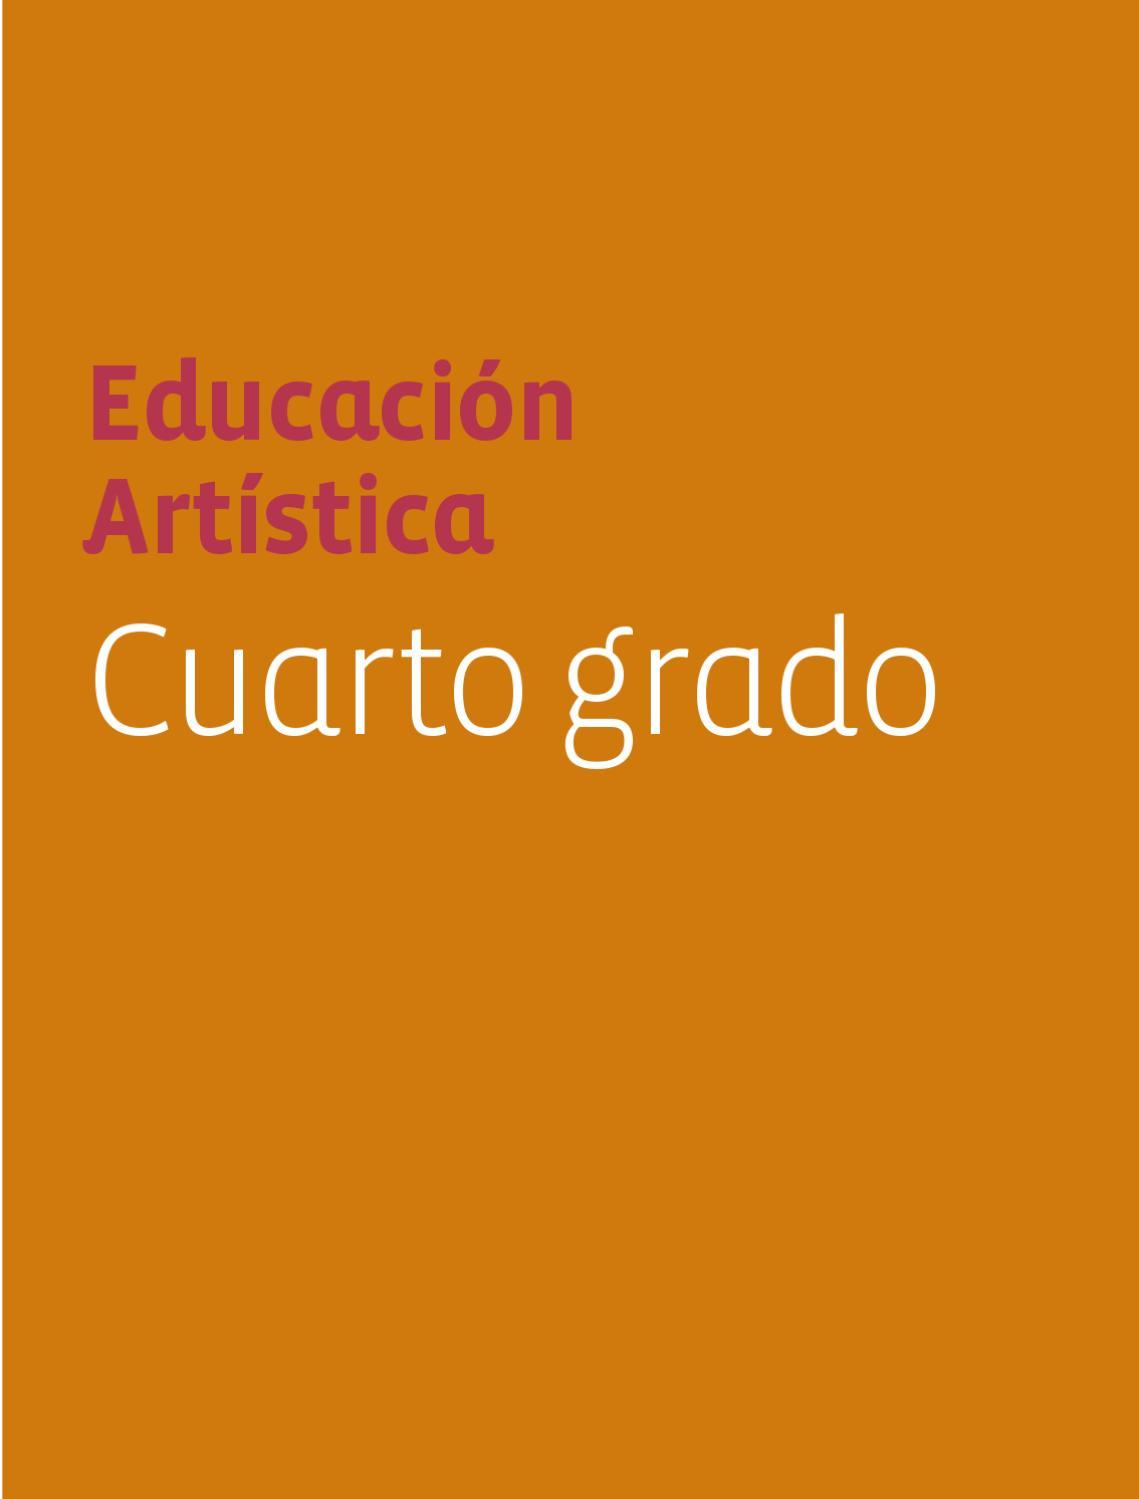 Educación Artistica 4to. Grado by Rarámuri - issuu